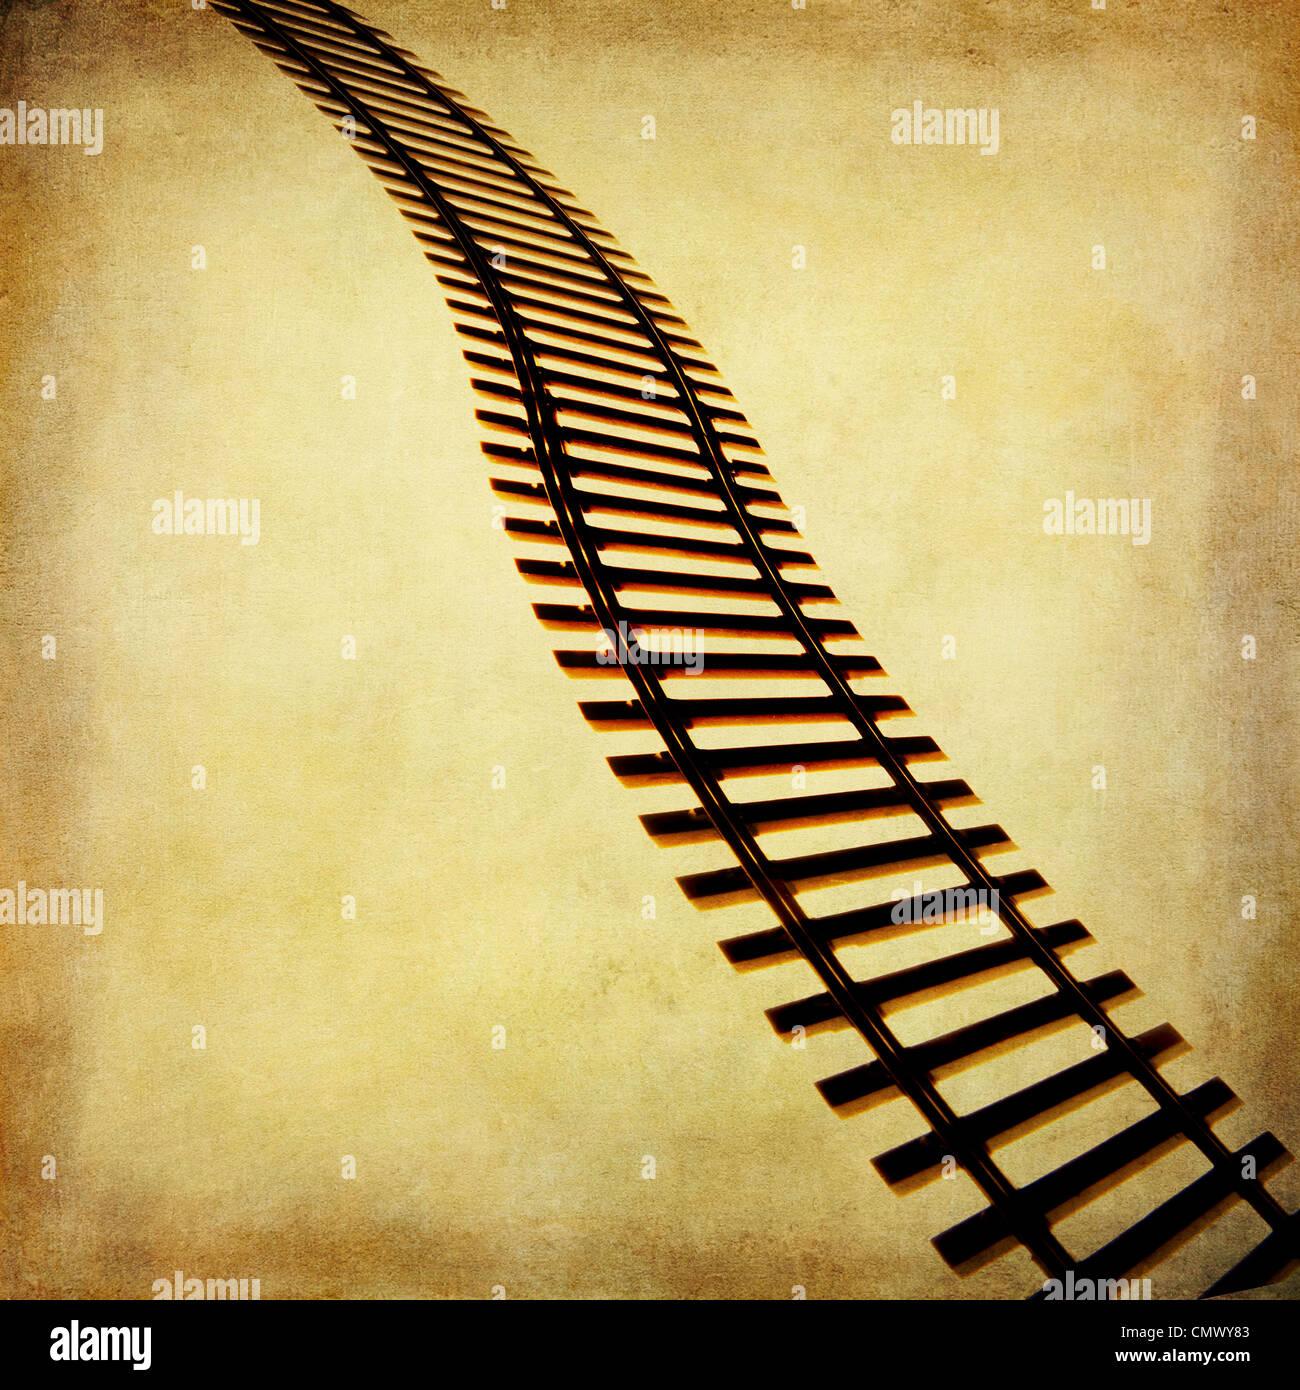 Railway track train tracks illustration. - Stock Image